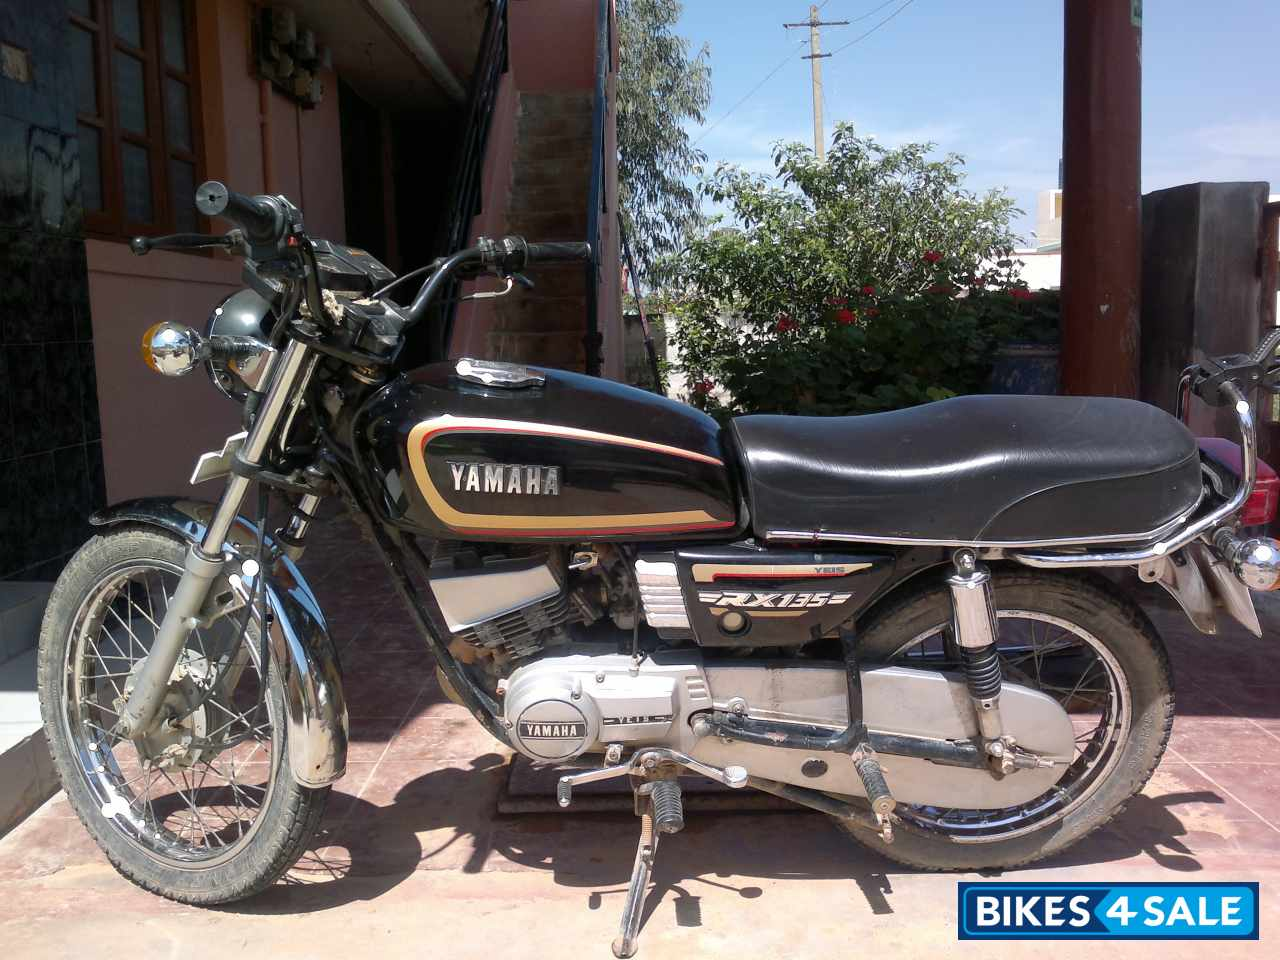 Yamaha Rx 135 Modified Black Black Yamaha RX 135 Pi...